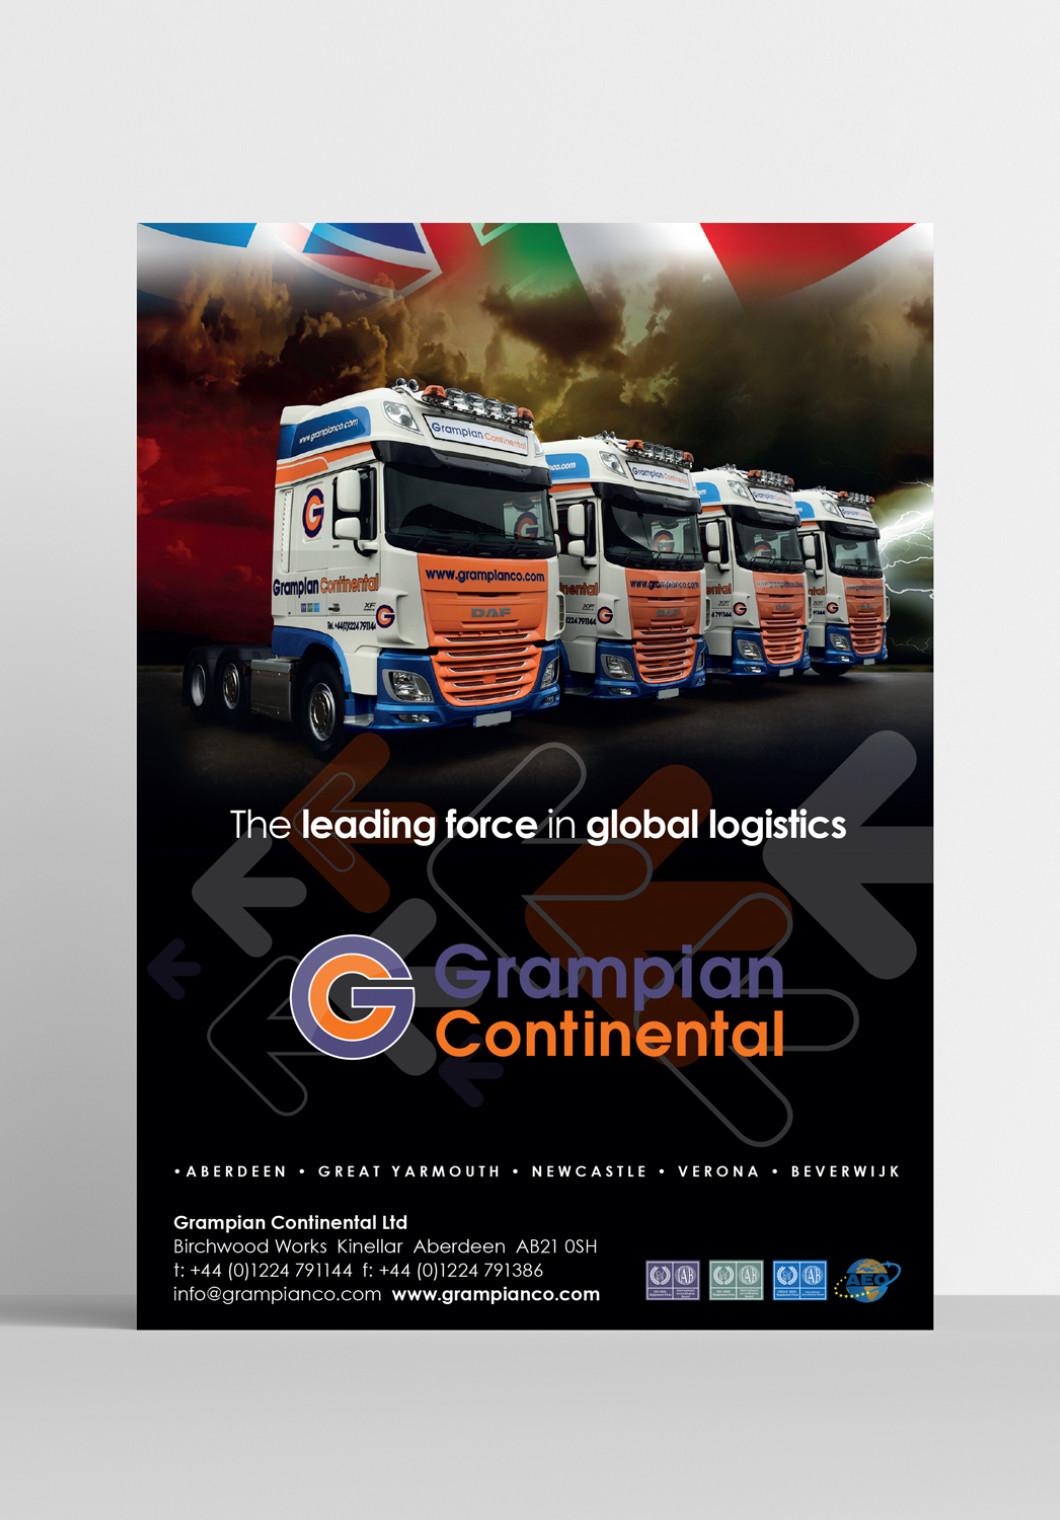 Grampian Continental